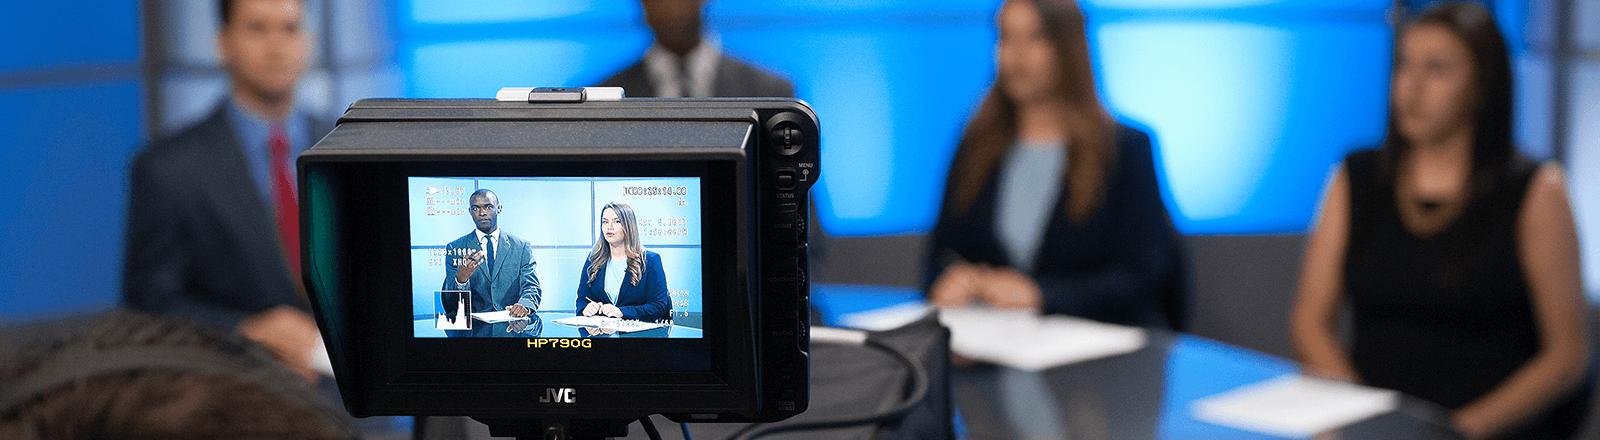 Filmed Student Broadcast